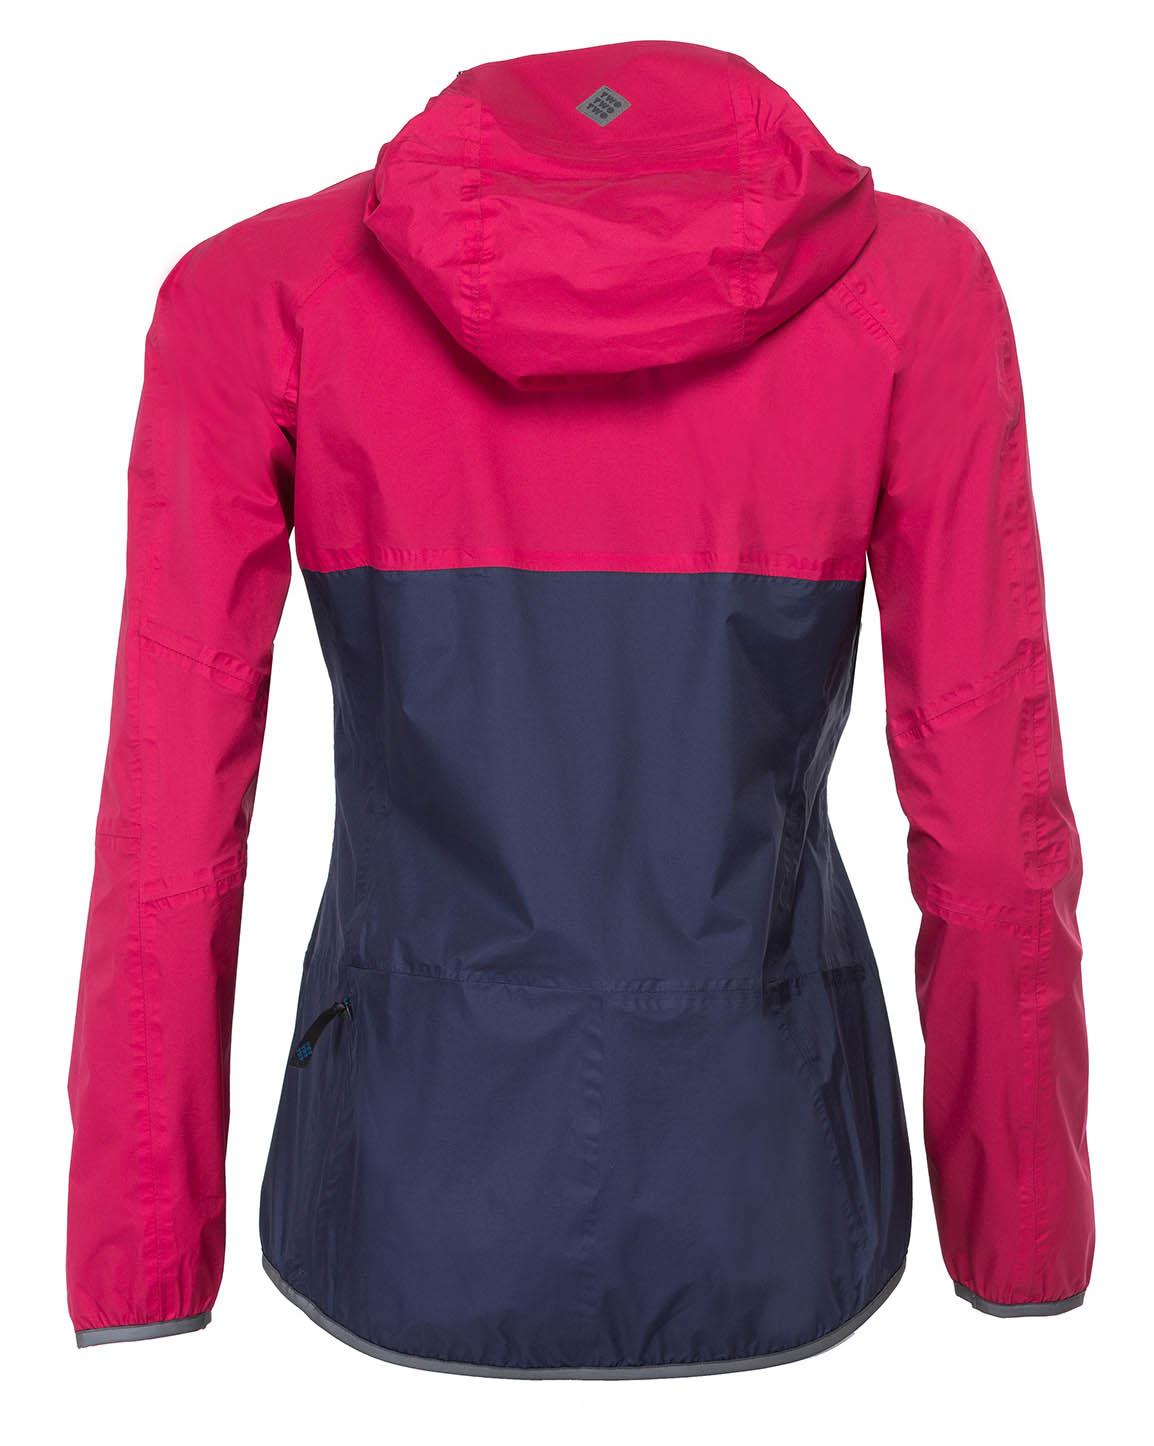 SMUDD Jacket Superlight 2 Layer Rain Women